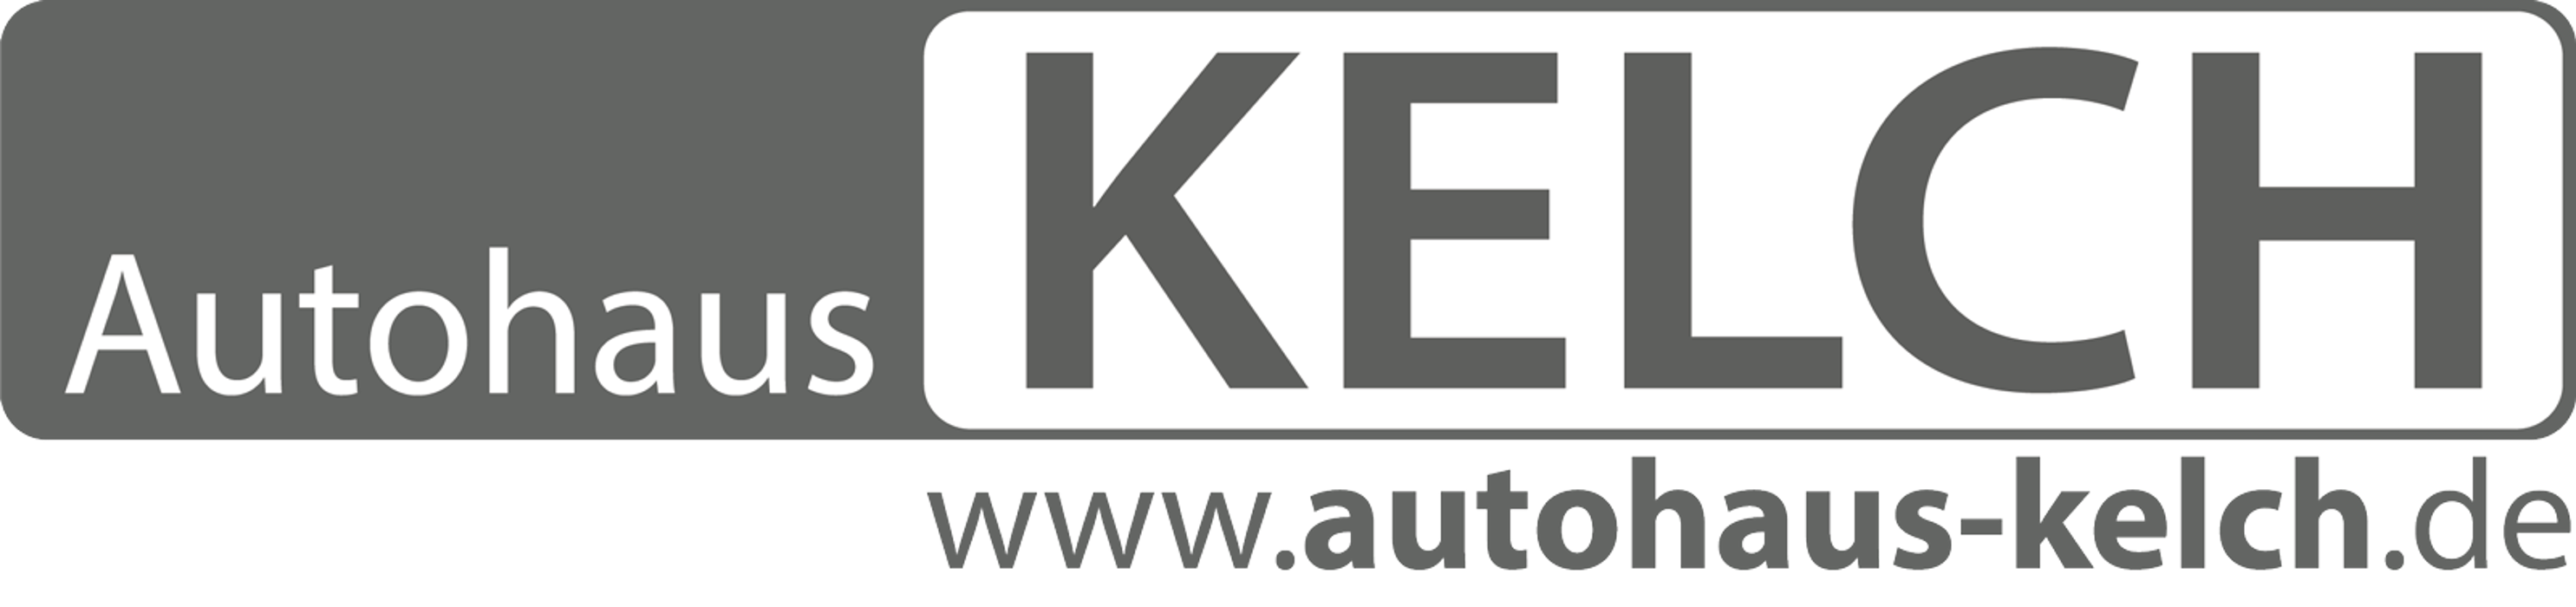 Autohaus Kelch GmbH & Co. KG